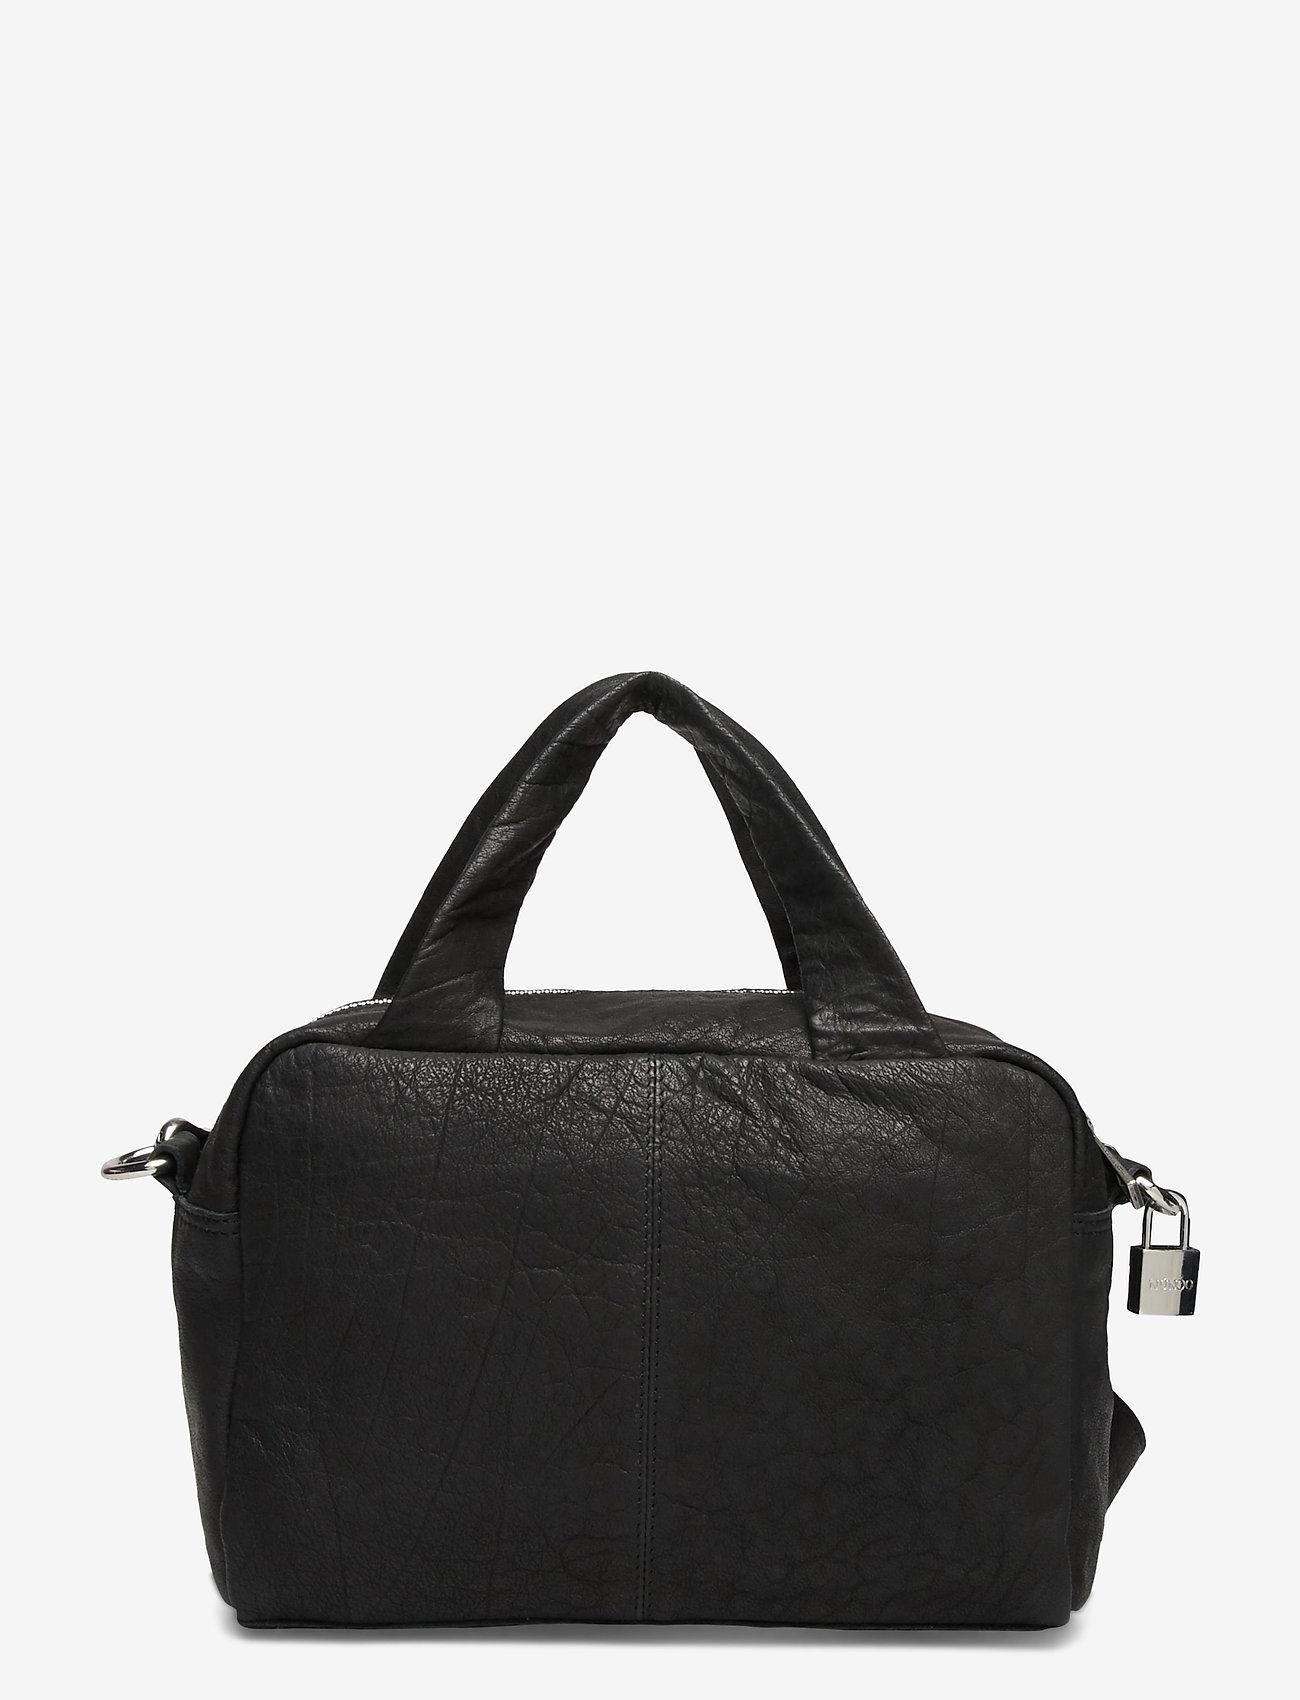 Nunoo - Donna urban - handväskor - black - 1